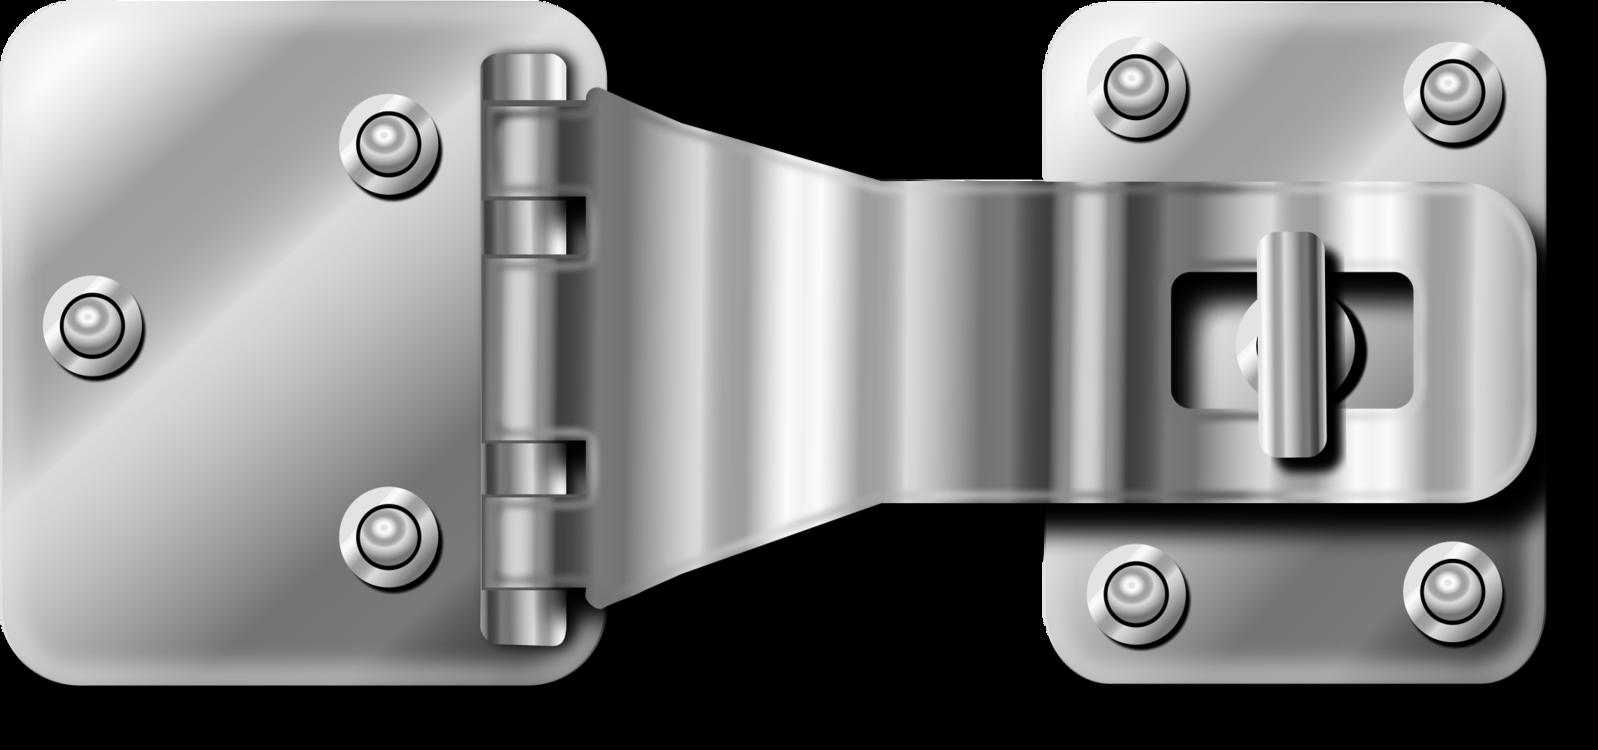 Angle,Metal,Hardware Accessory